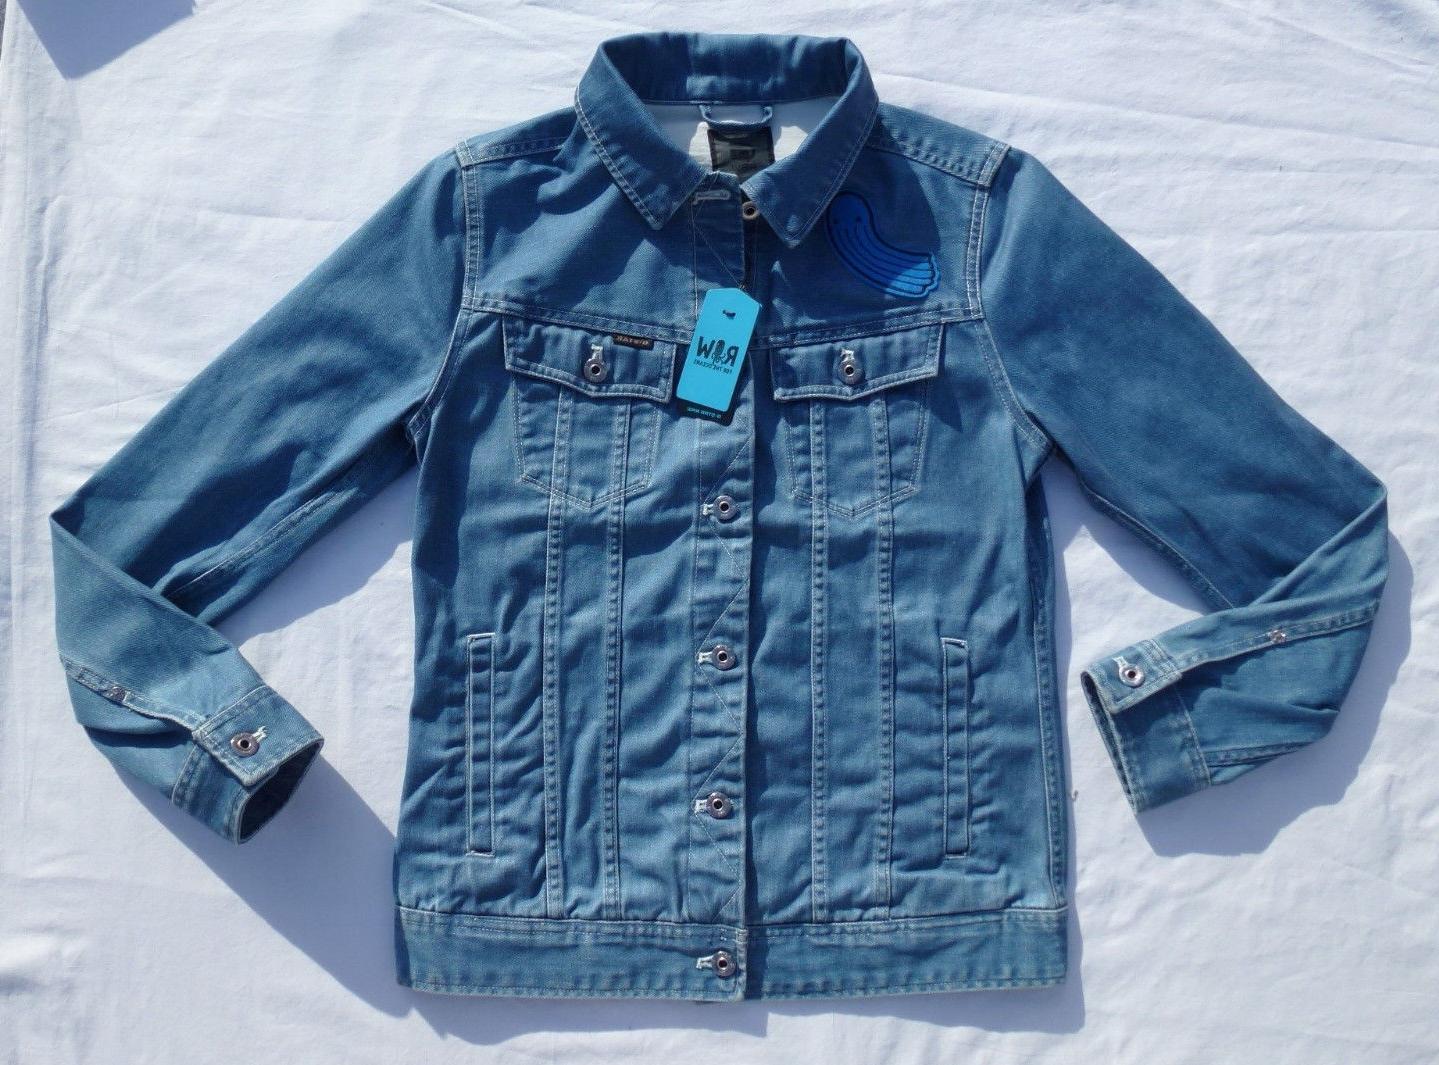 G-Star Raw For Thr Ocean Drop 1 Slim Tailor 3D Denim Jacket